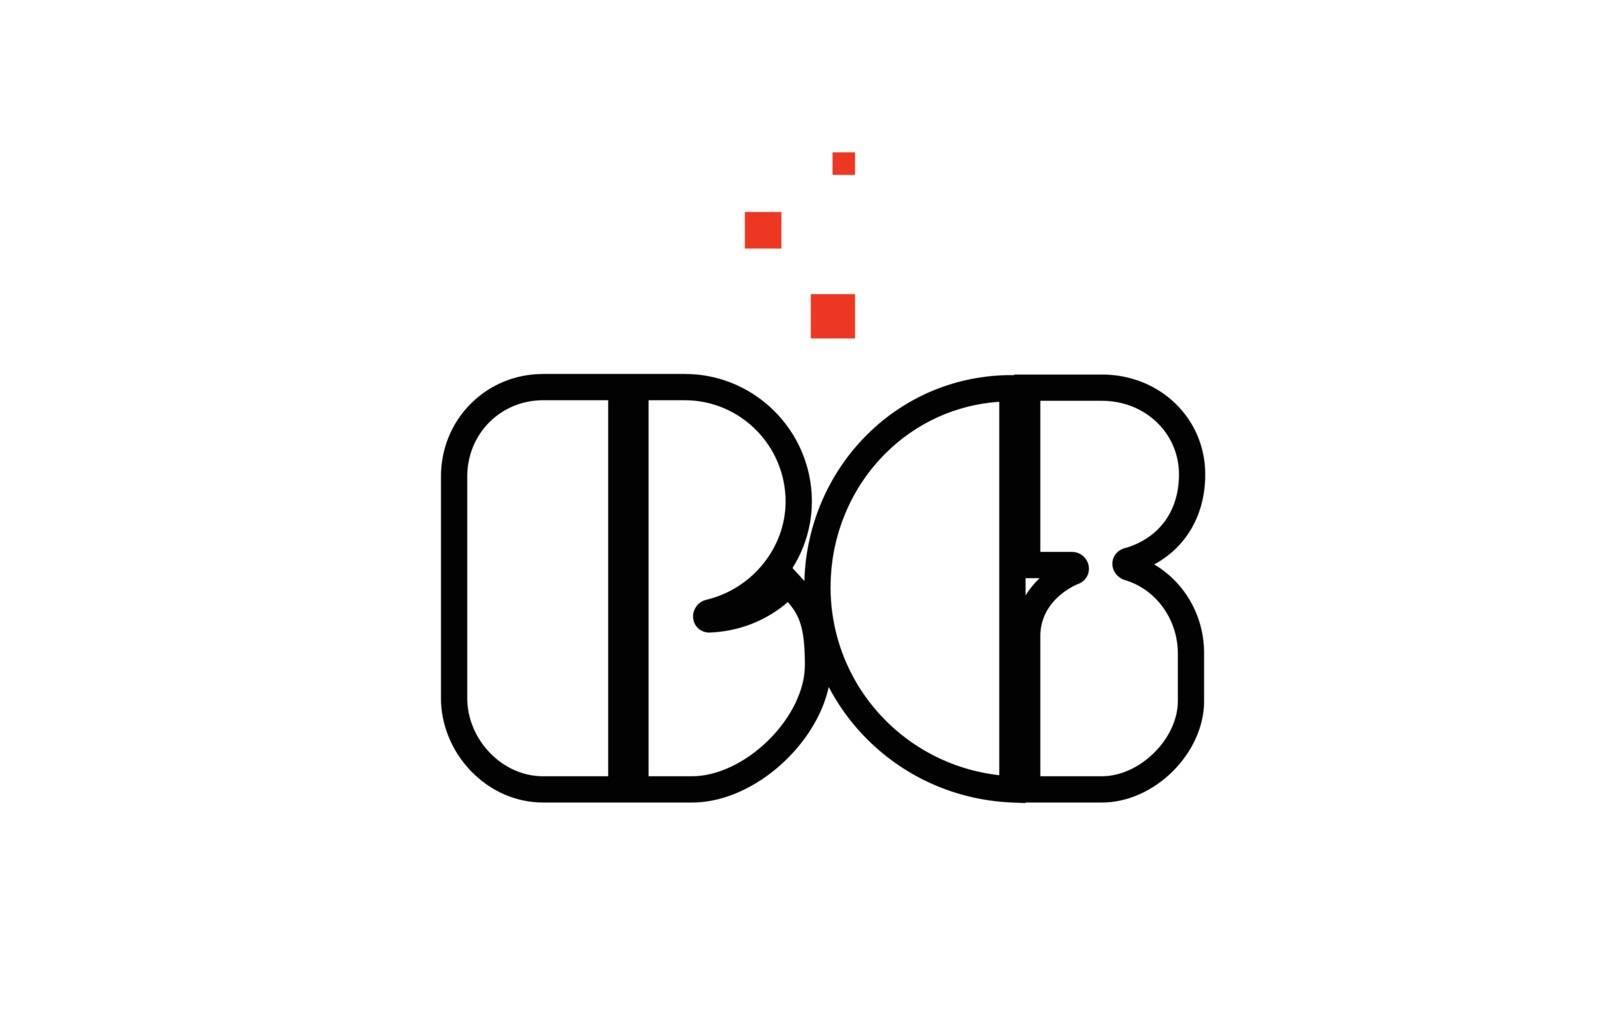 BG B G black white red alphabet letter combination logo icon des by dragomirescu